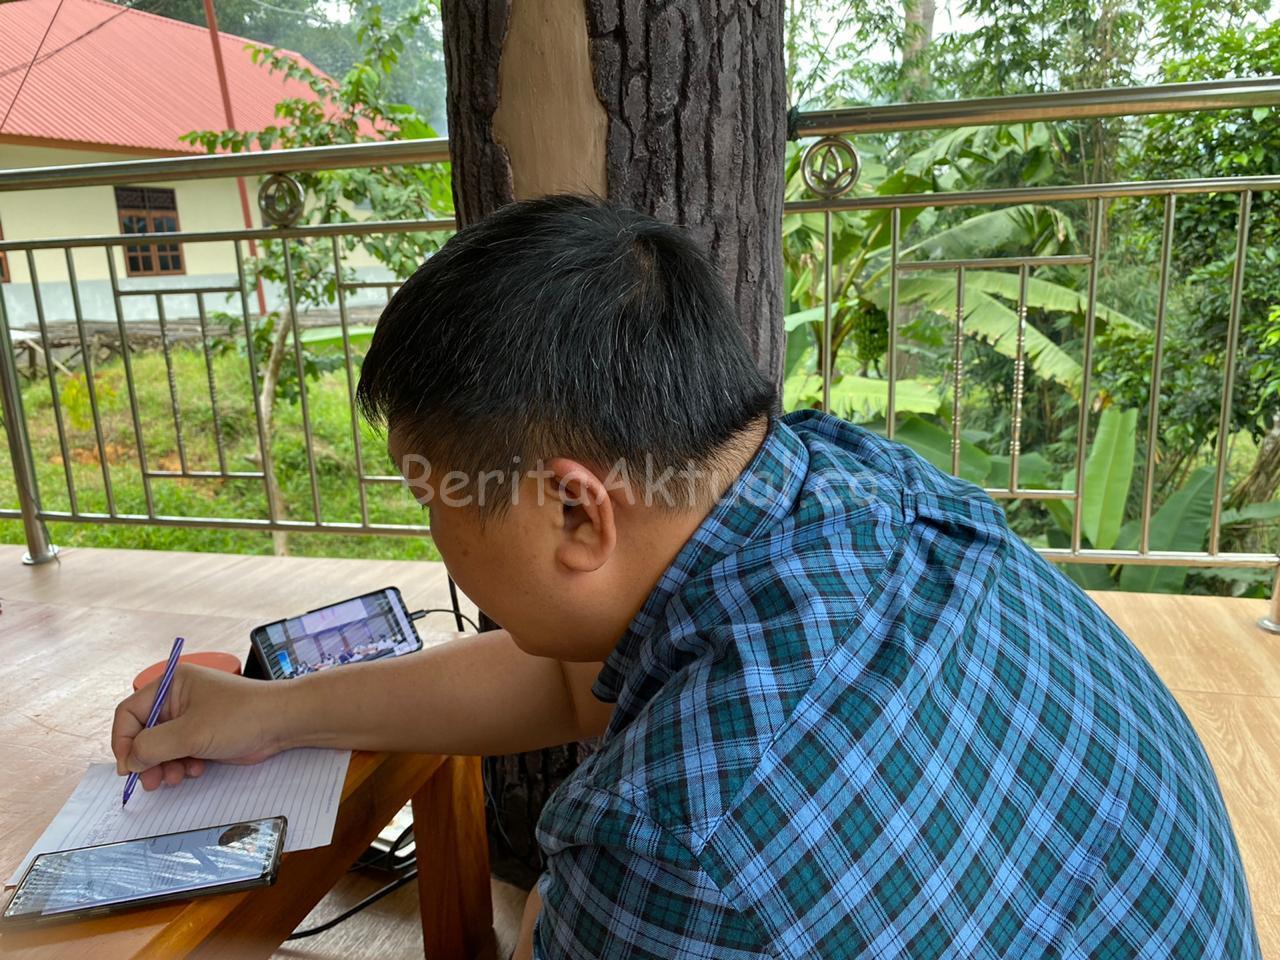 Tegas Rico Sia, Harga Mati Pembangunan Smelter Harus di Tanah Papua 1 IMG 20200630 WA0093